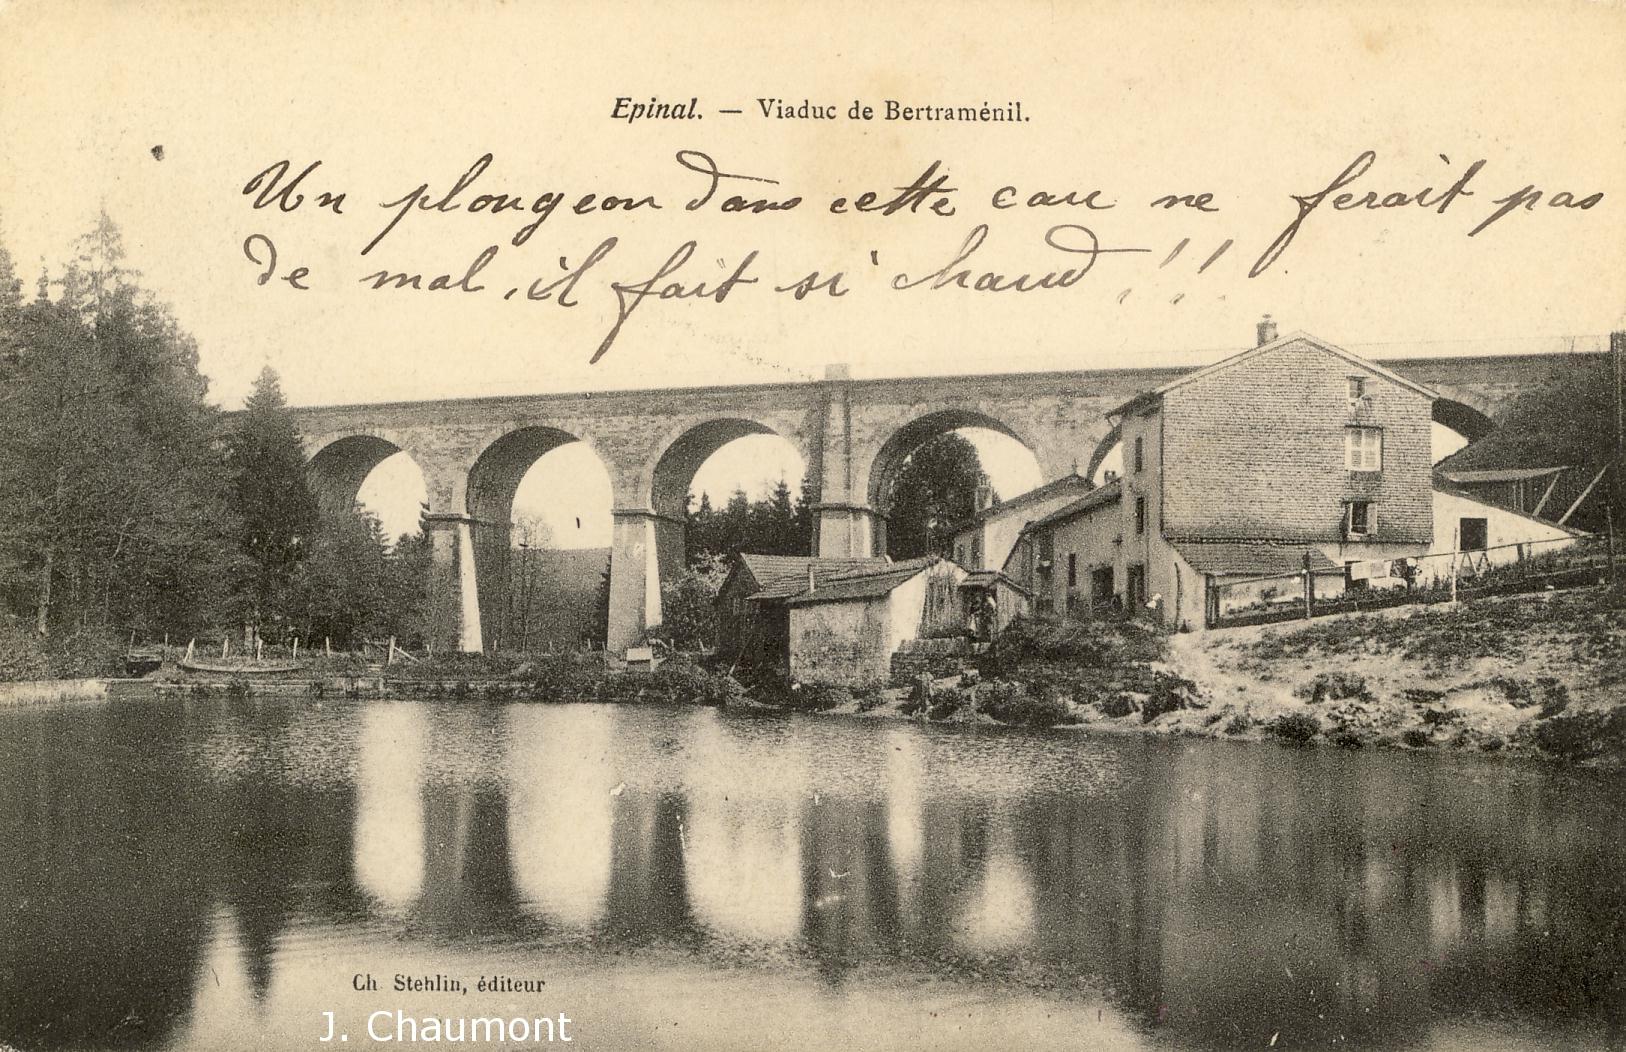 Viaduc de Bertraménil